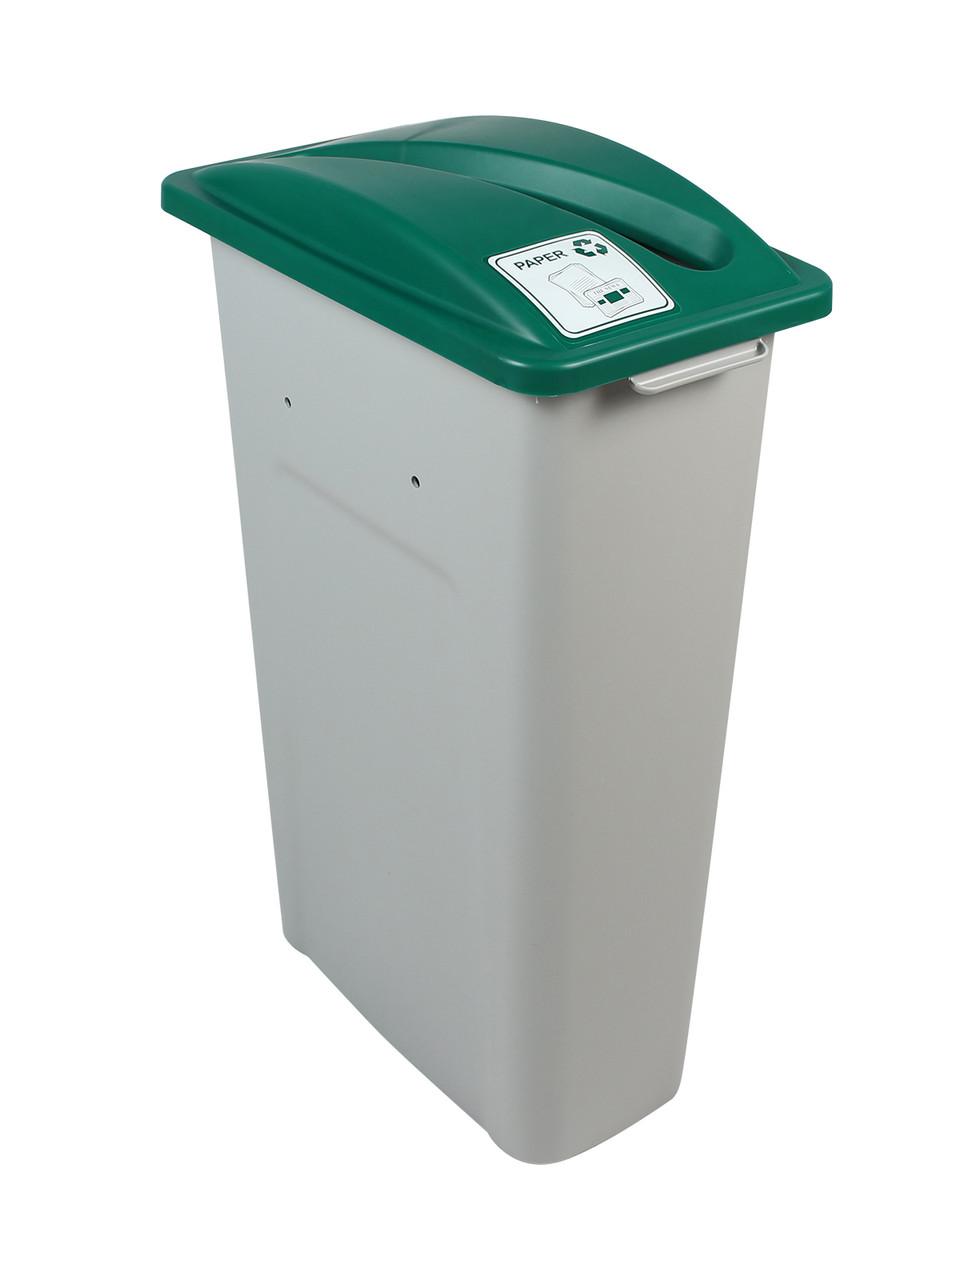 23 Gallon Skinny Simple Sort Recycle Bin (Paper, Green Lid)